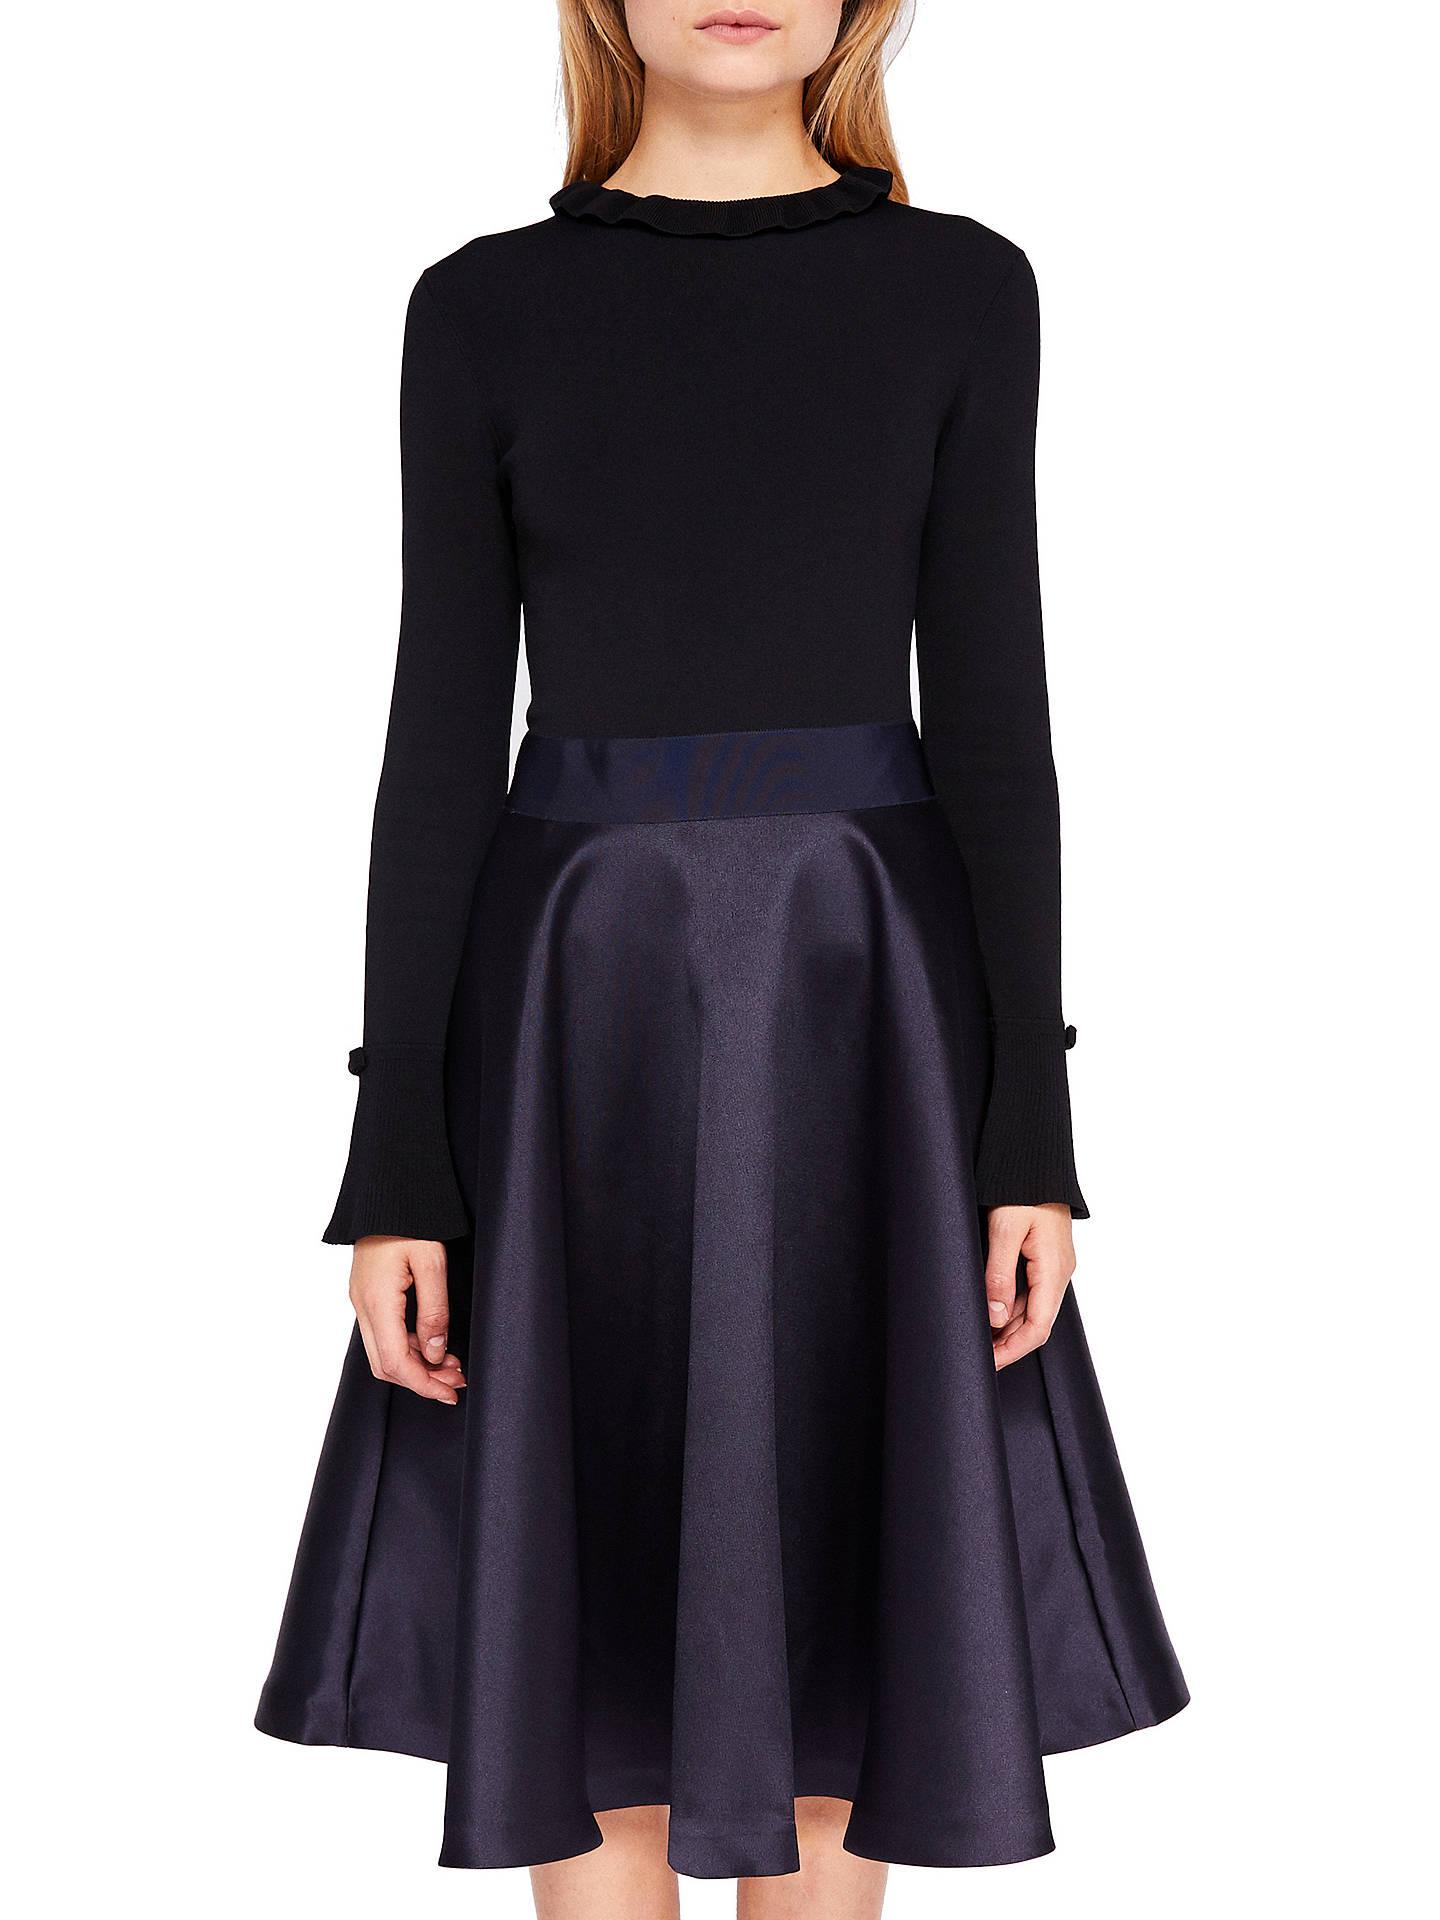 c255d6c53ee8 Buy Ted Baker Zadi Frill Cuff Dress